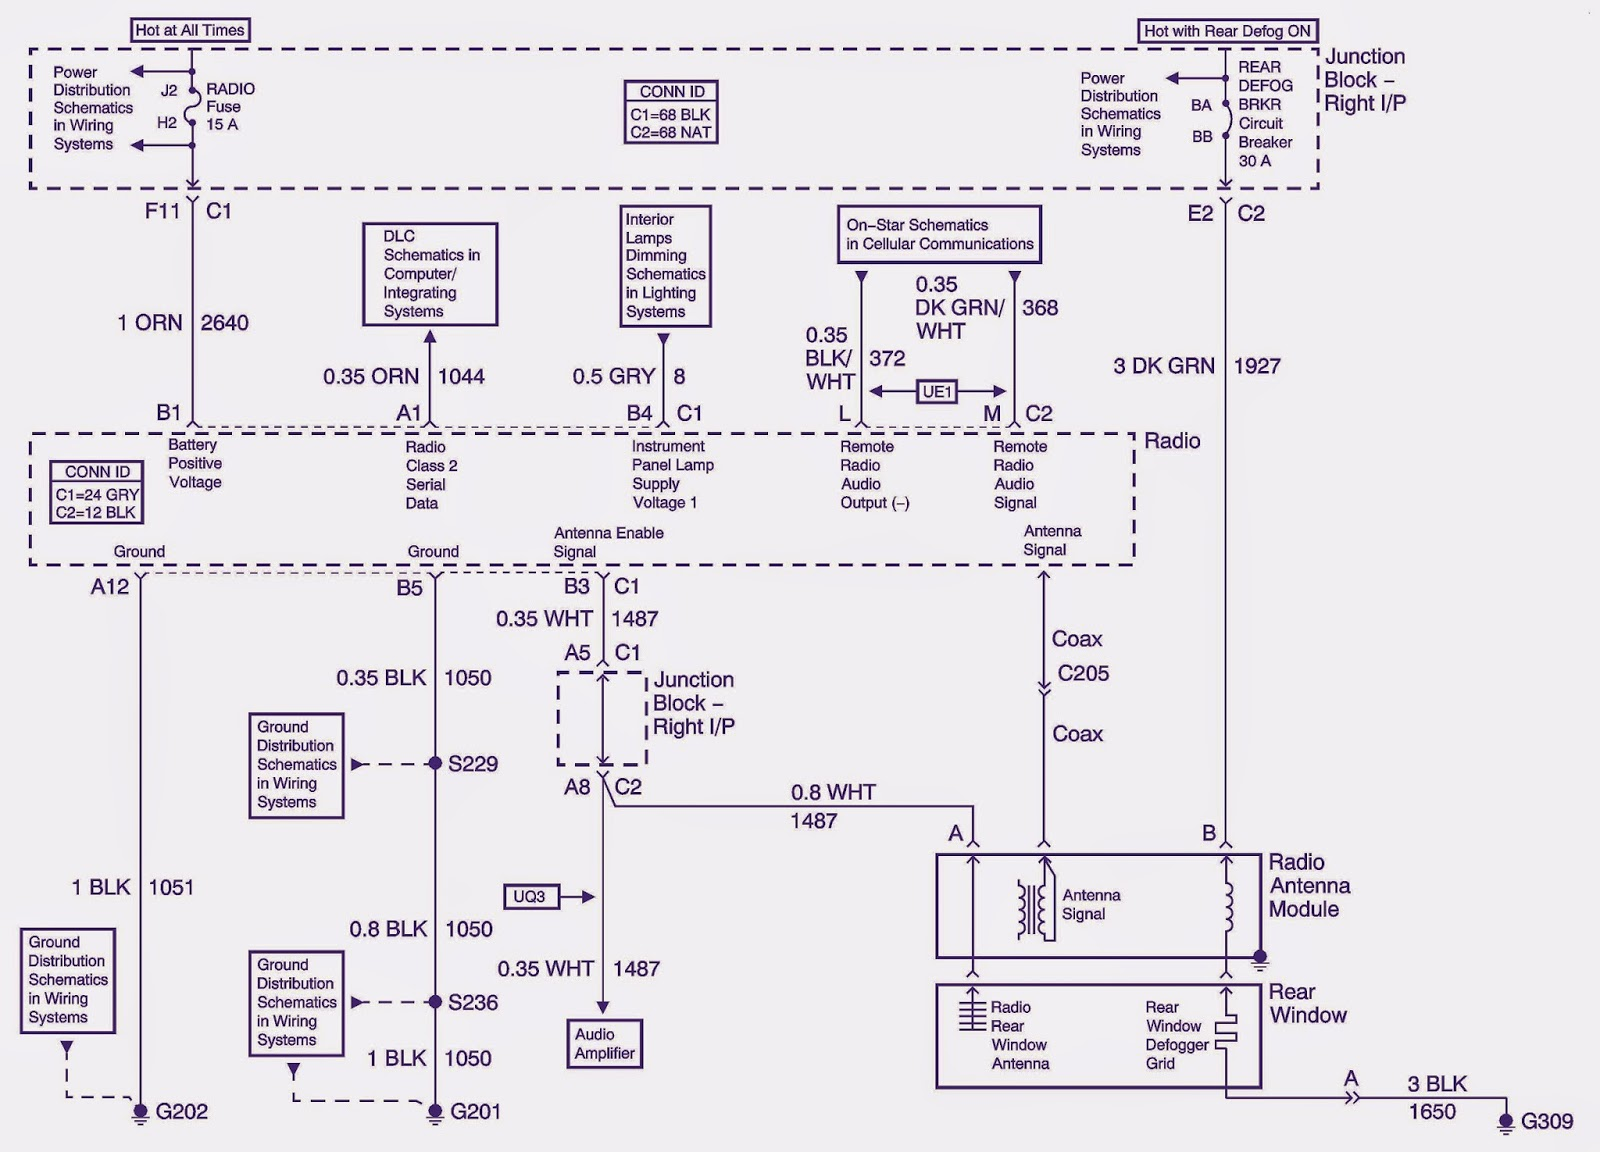 1999 Chevy Monte Carlo Wiring Diagram - Free Download Wiring Diagram